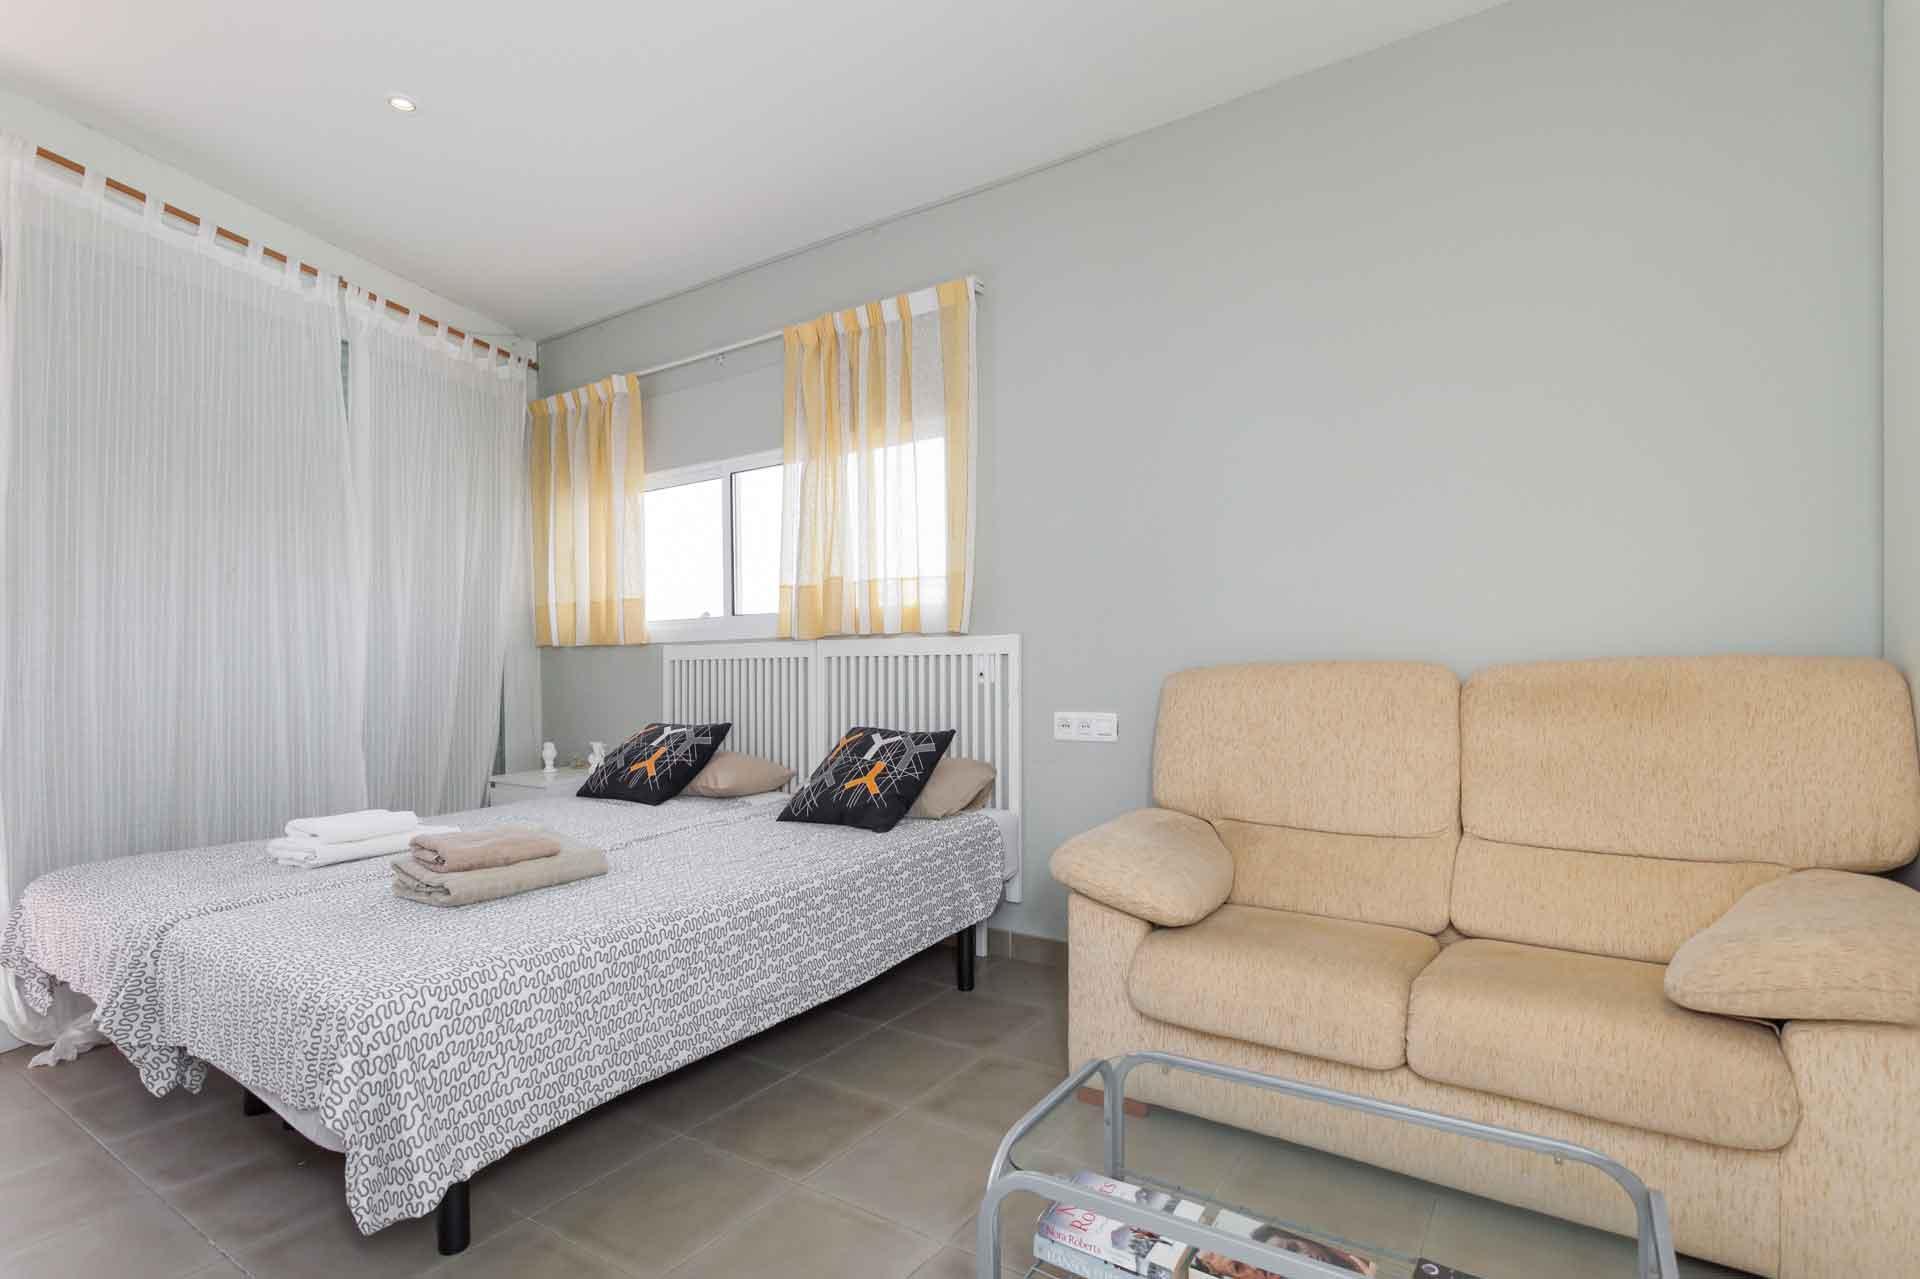 Villa Sitges Mariposa room for 2 people